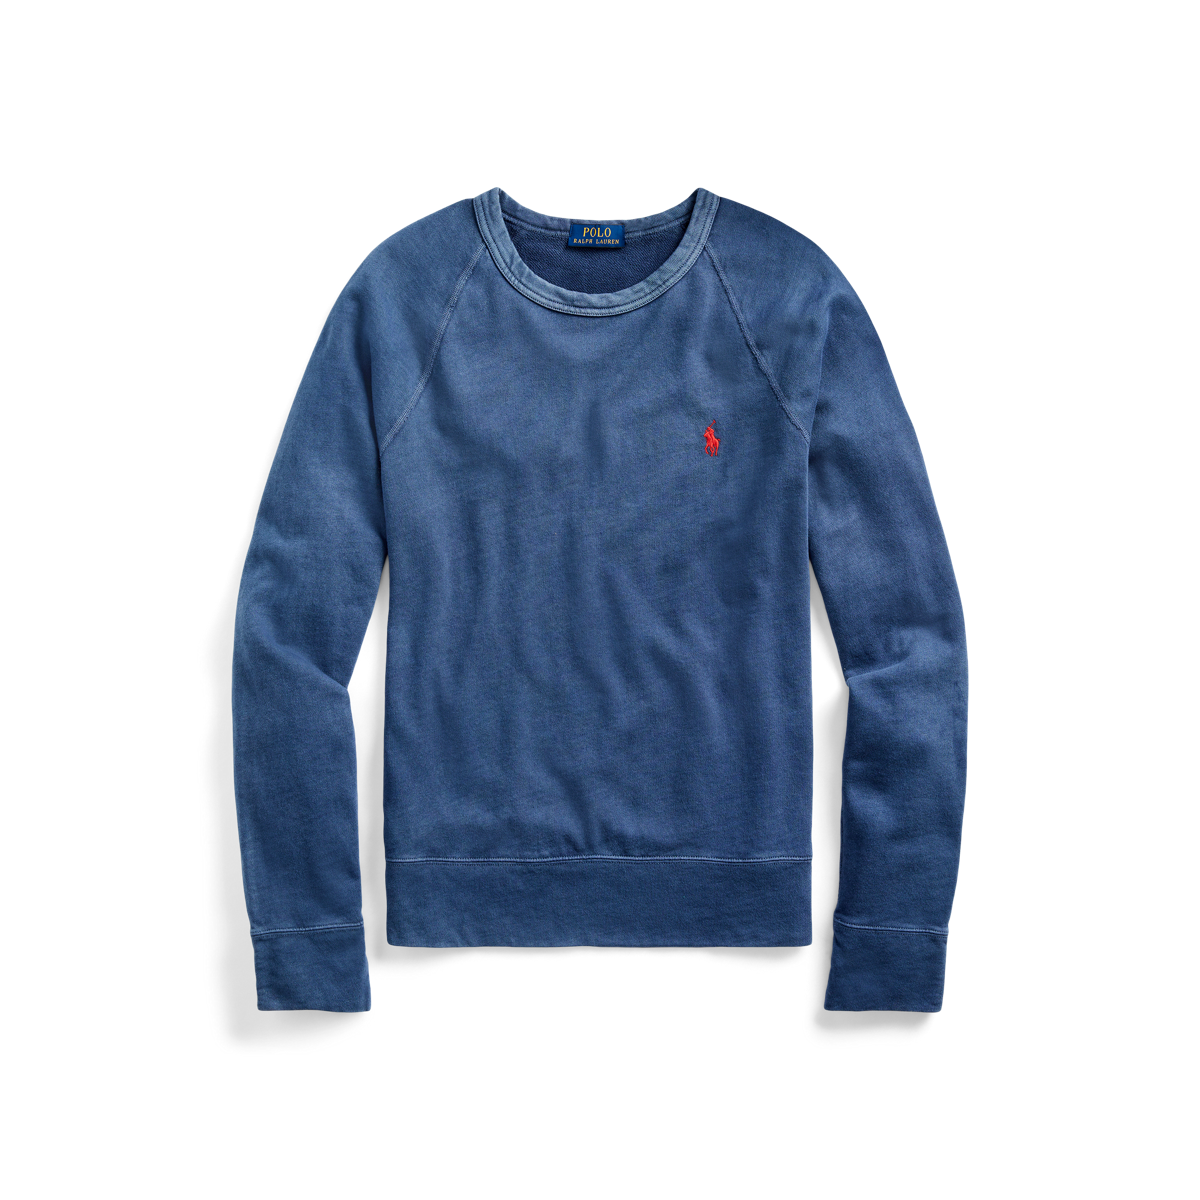 Terry Cotton Sweatshirt Cotton Terry Sweatshirt Spa Cotton Spa WOc7qYcwH